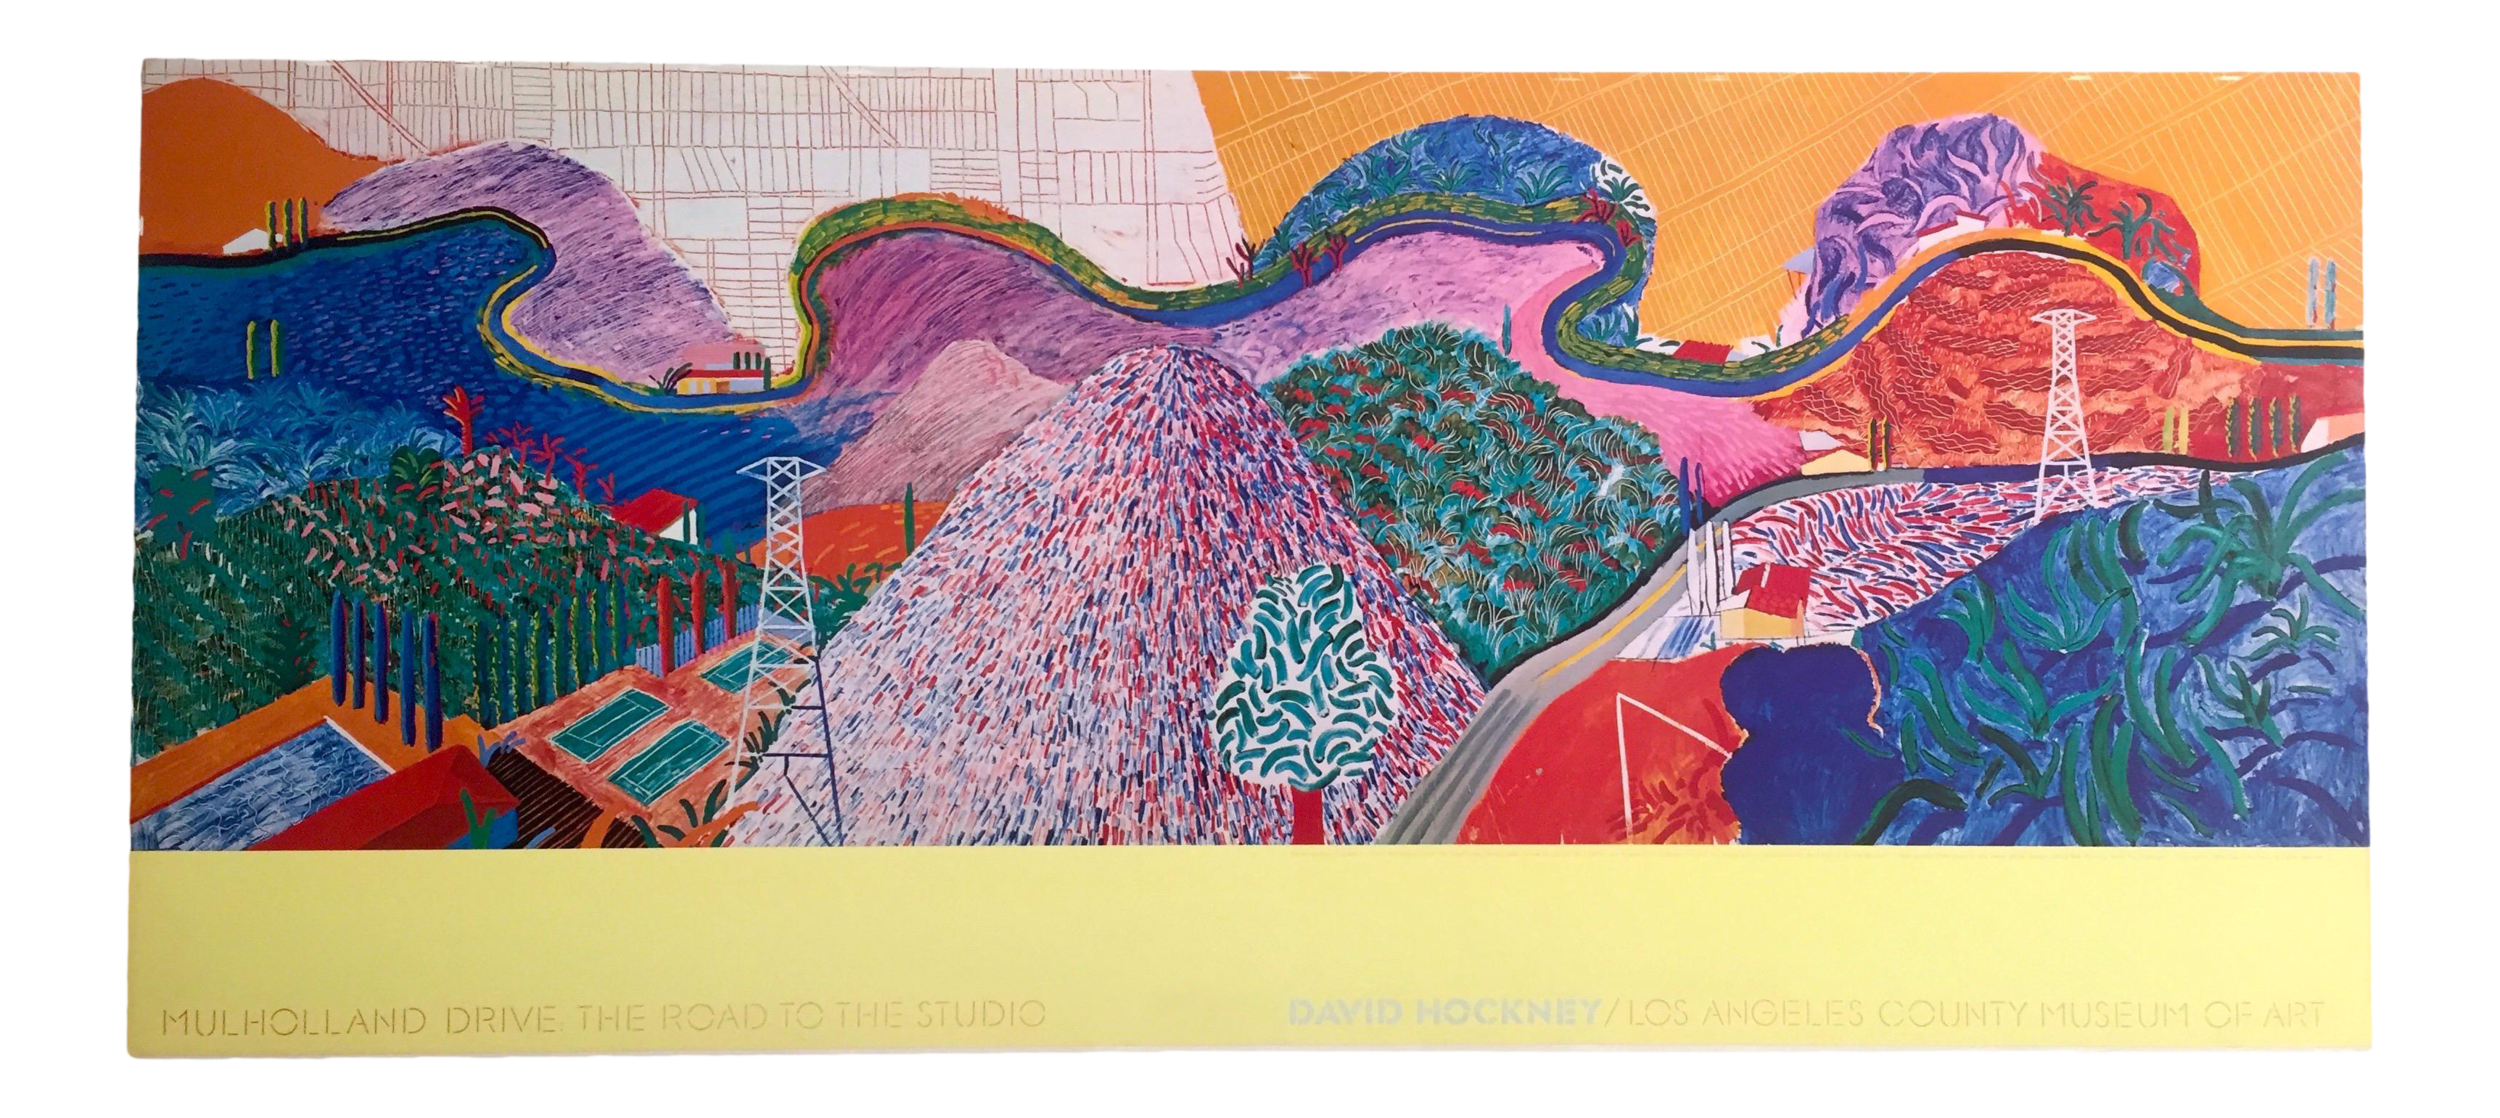 rare-1980-david-hockney-original-collotype-print-poster-mulholland-drive-7800.png